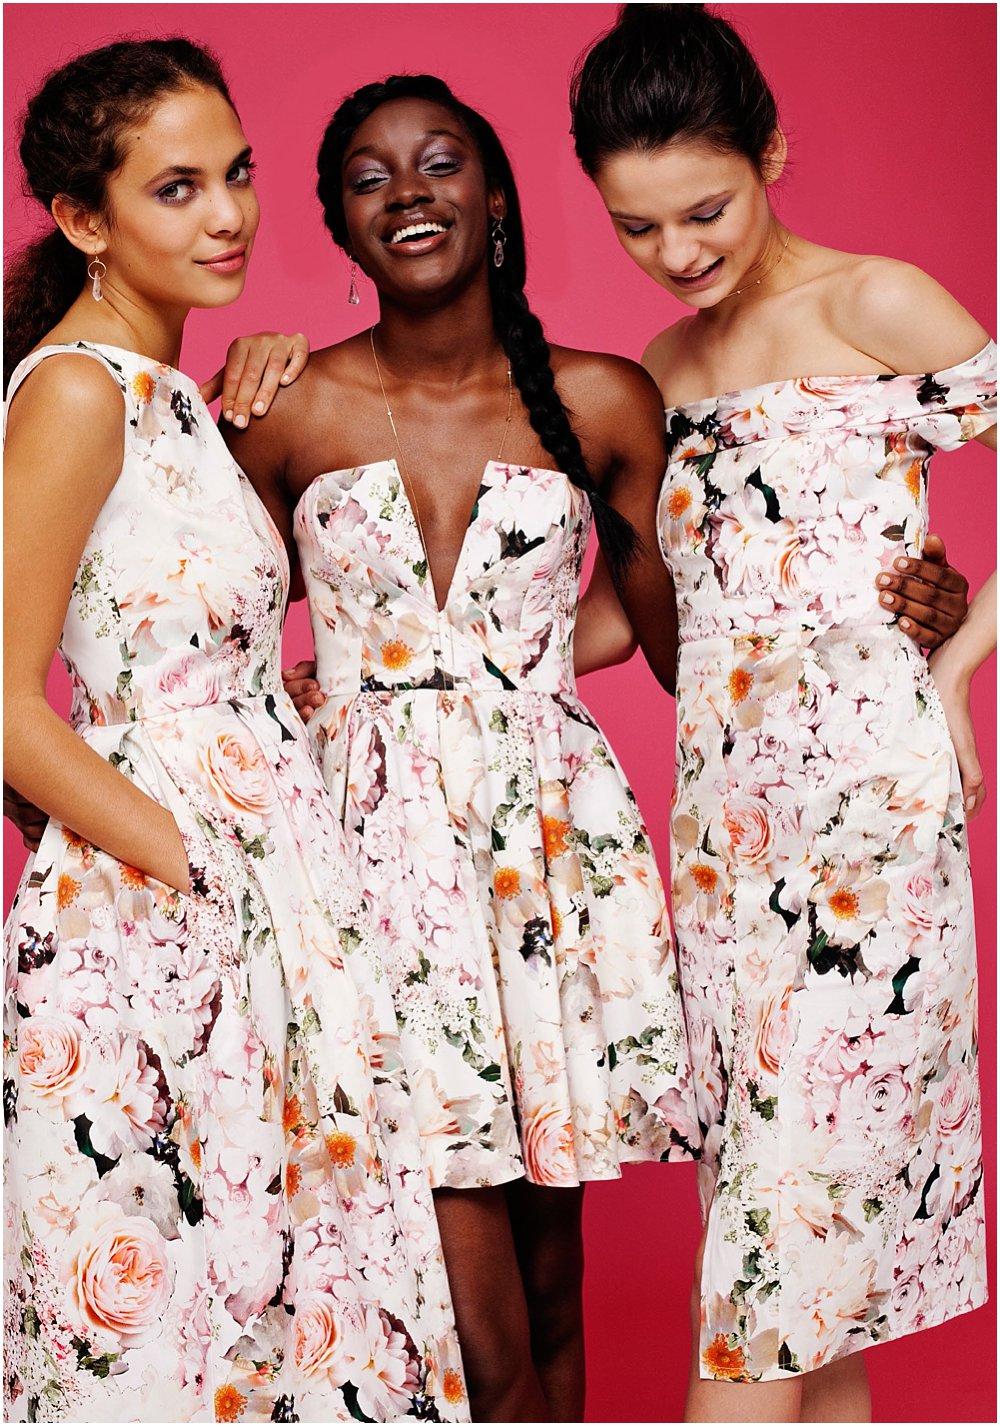 Asos Spring 2015 occasionwear